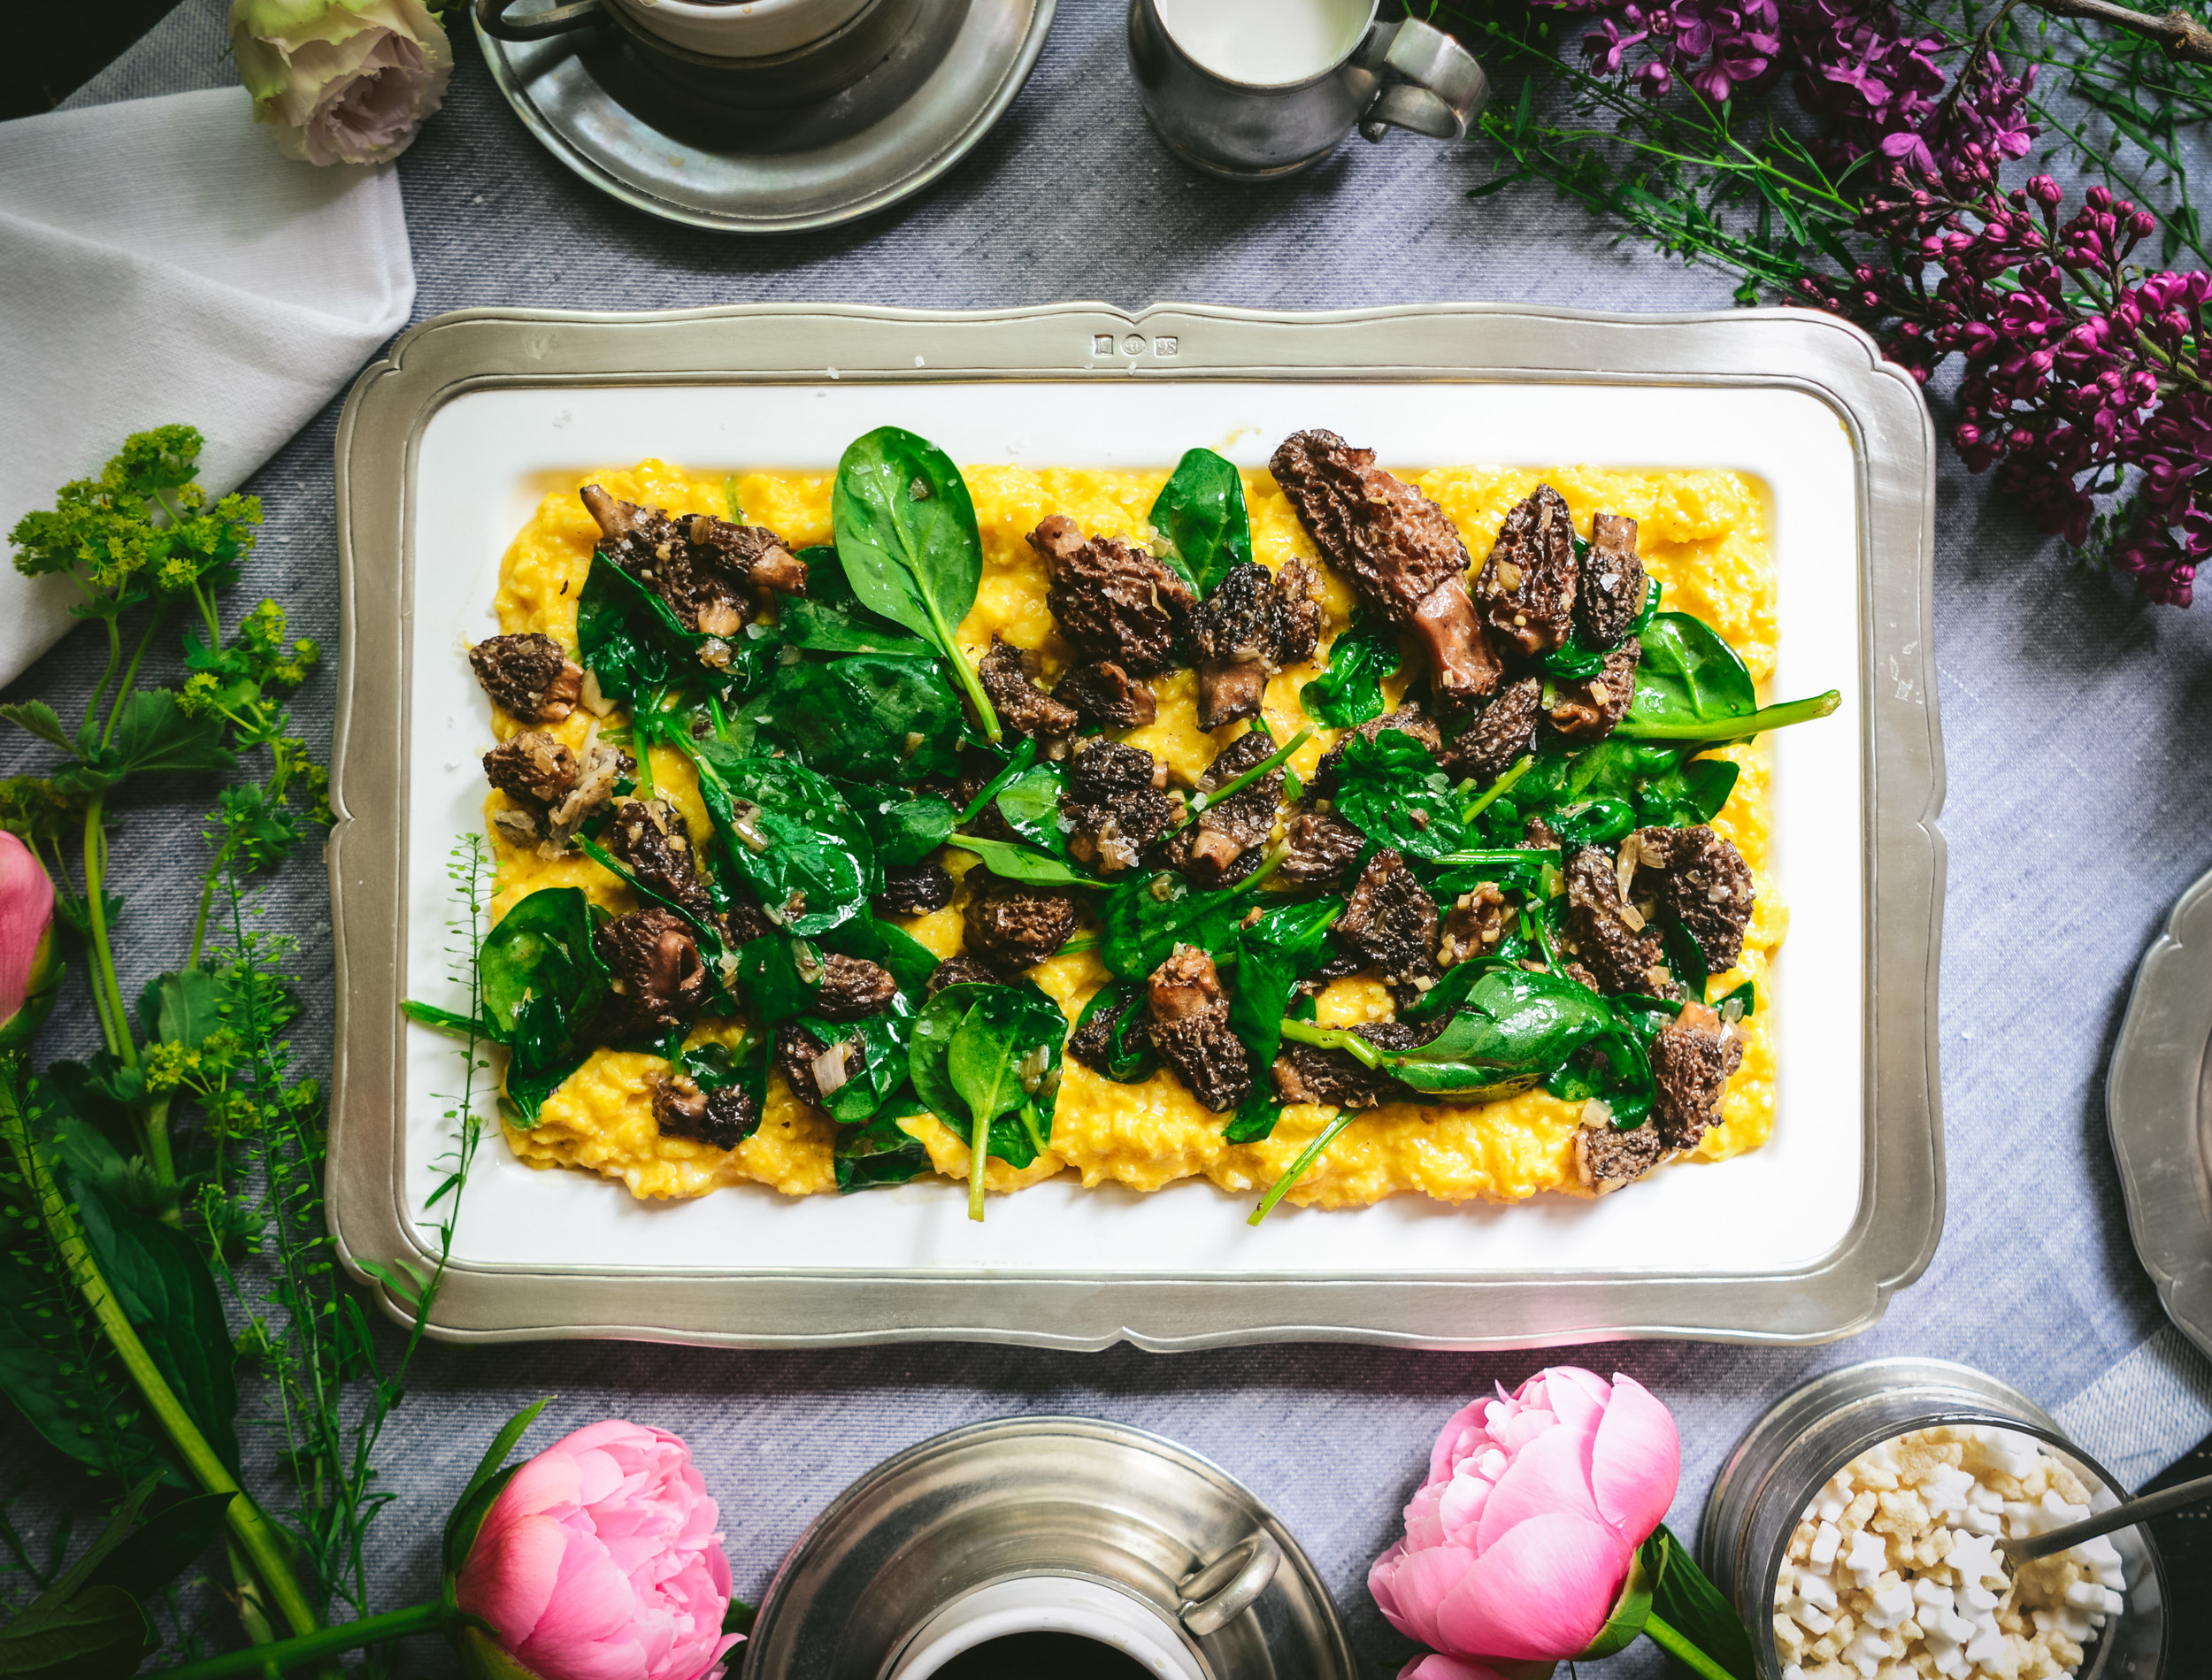 Morel_Mushrooms_Spinach_&_Eggs_Weston_Table.jpg